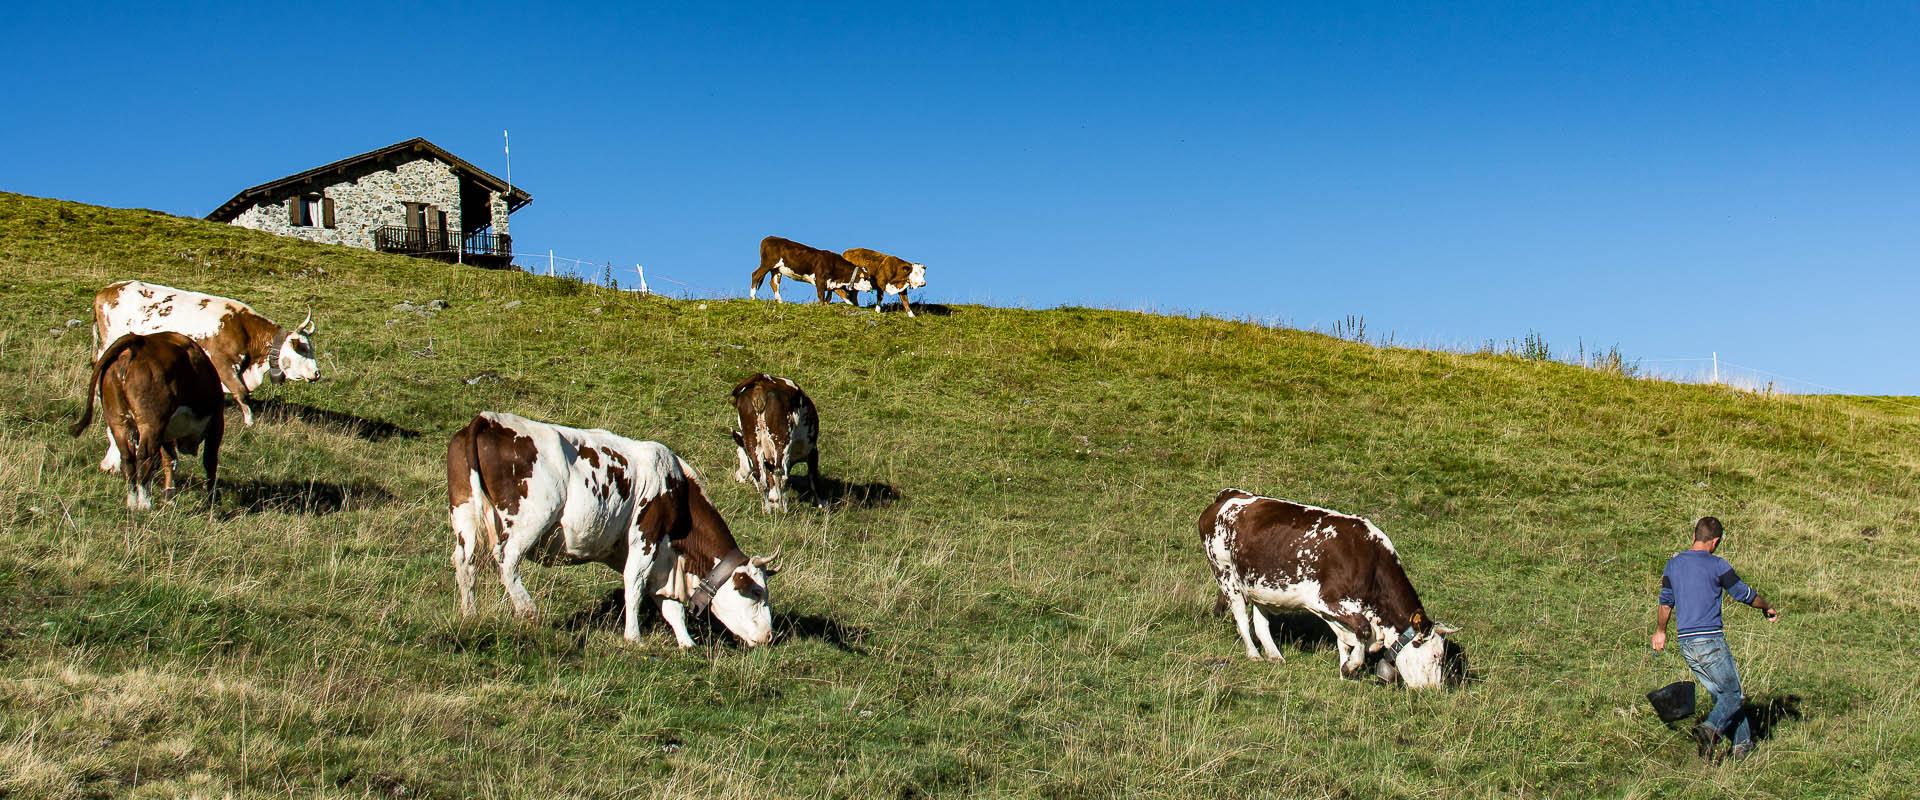 alpemoncerchio-mucche-con-margaro